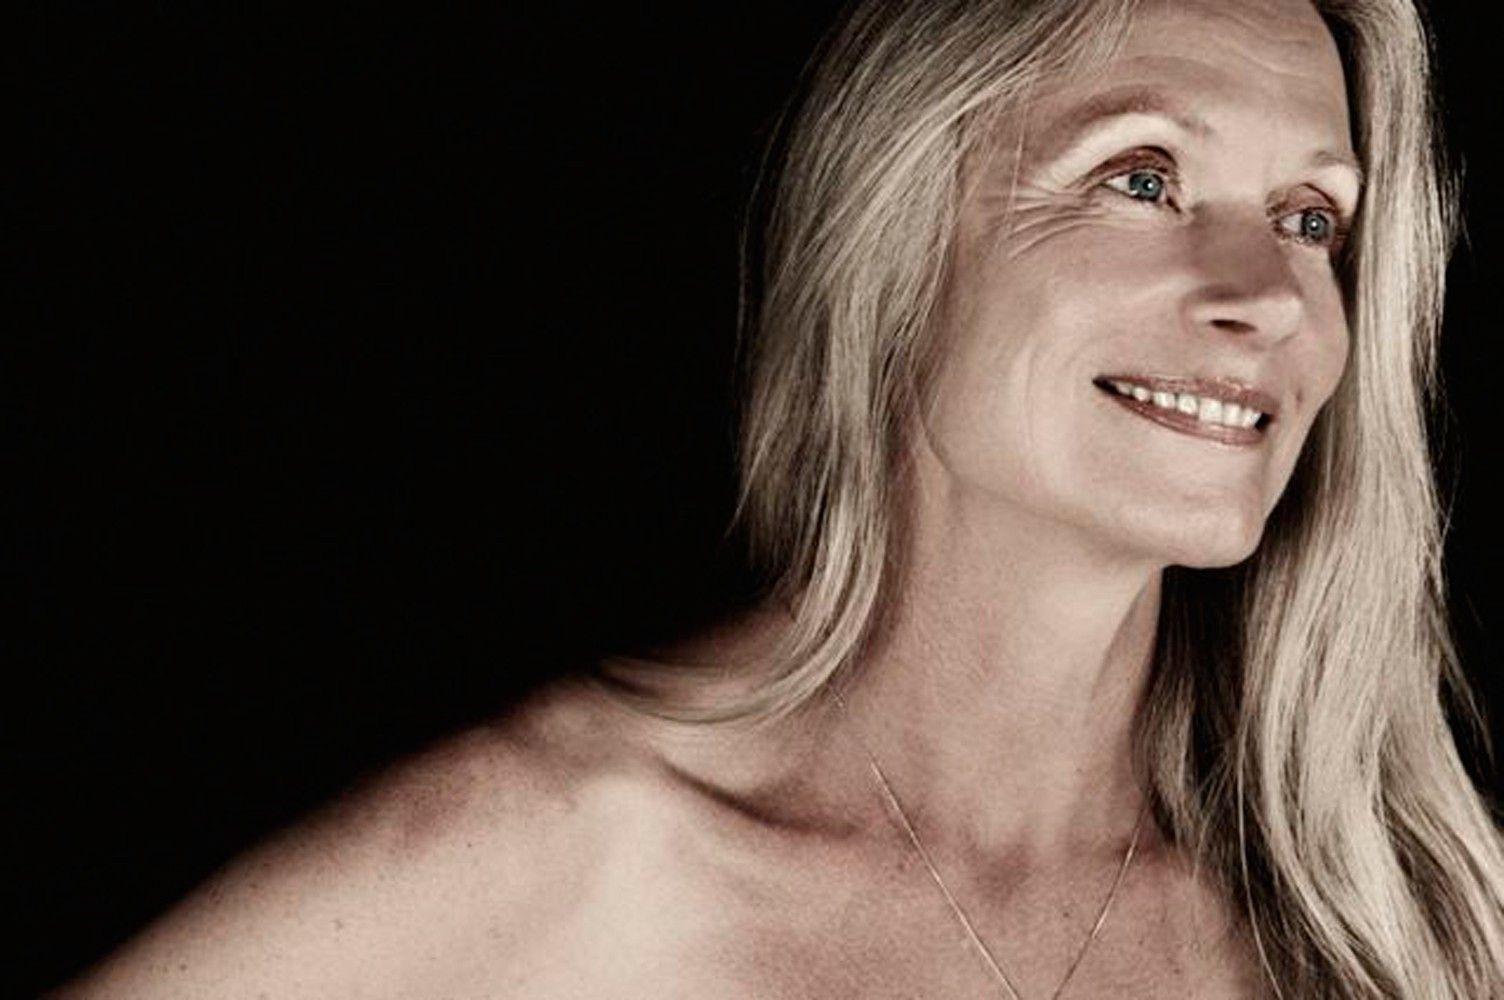 Pia Gronning - Danish model - seen on Hello Lovely Studio